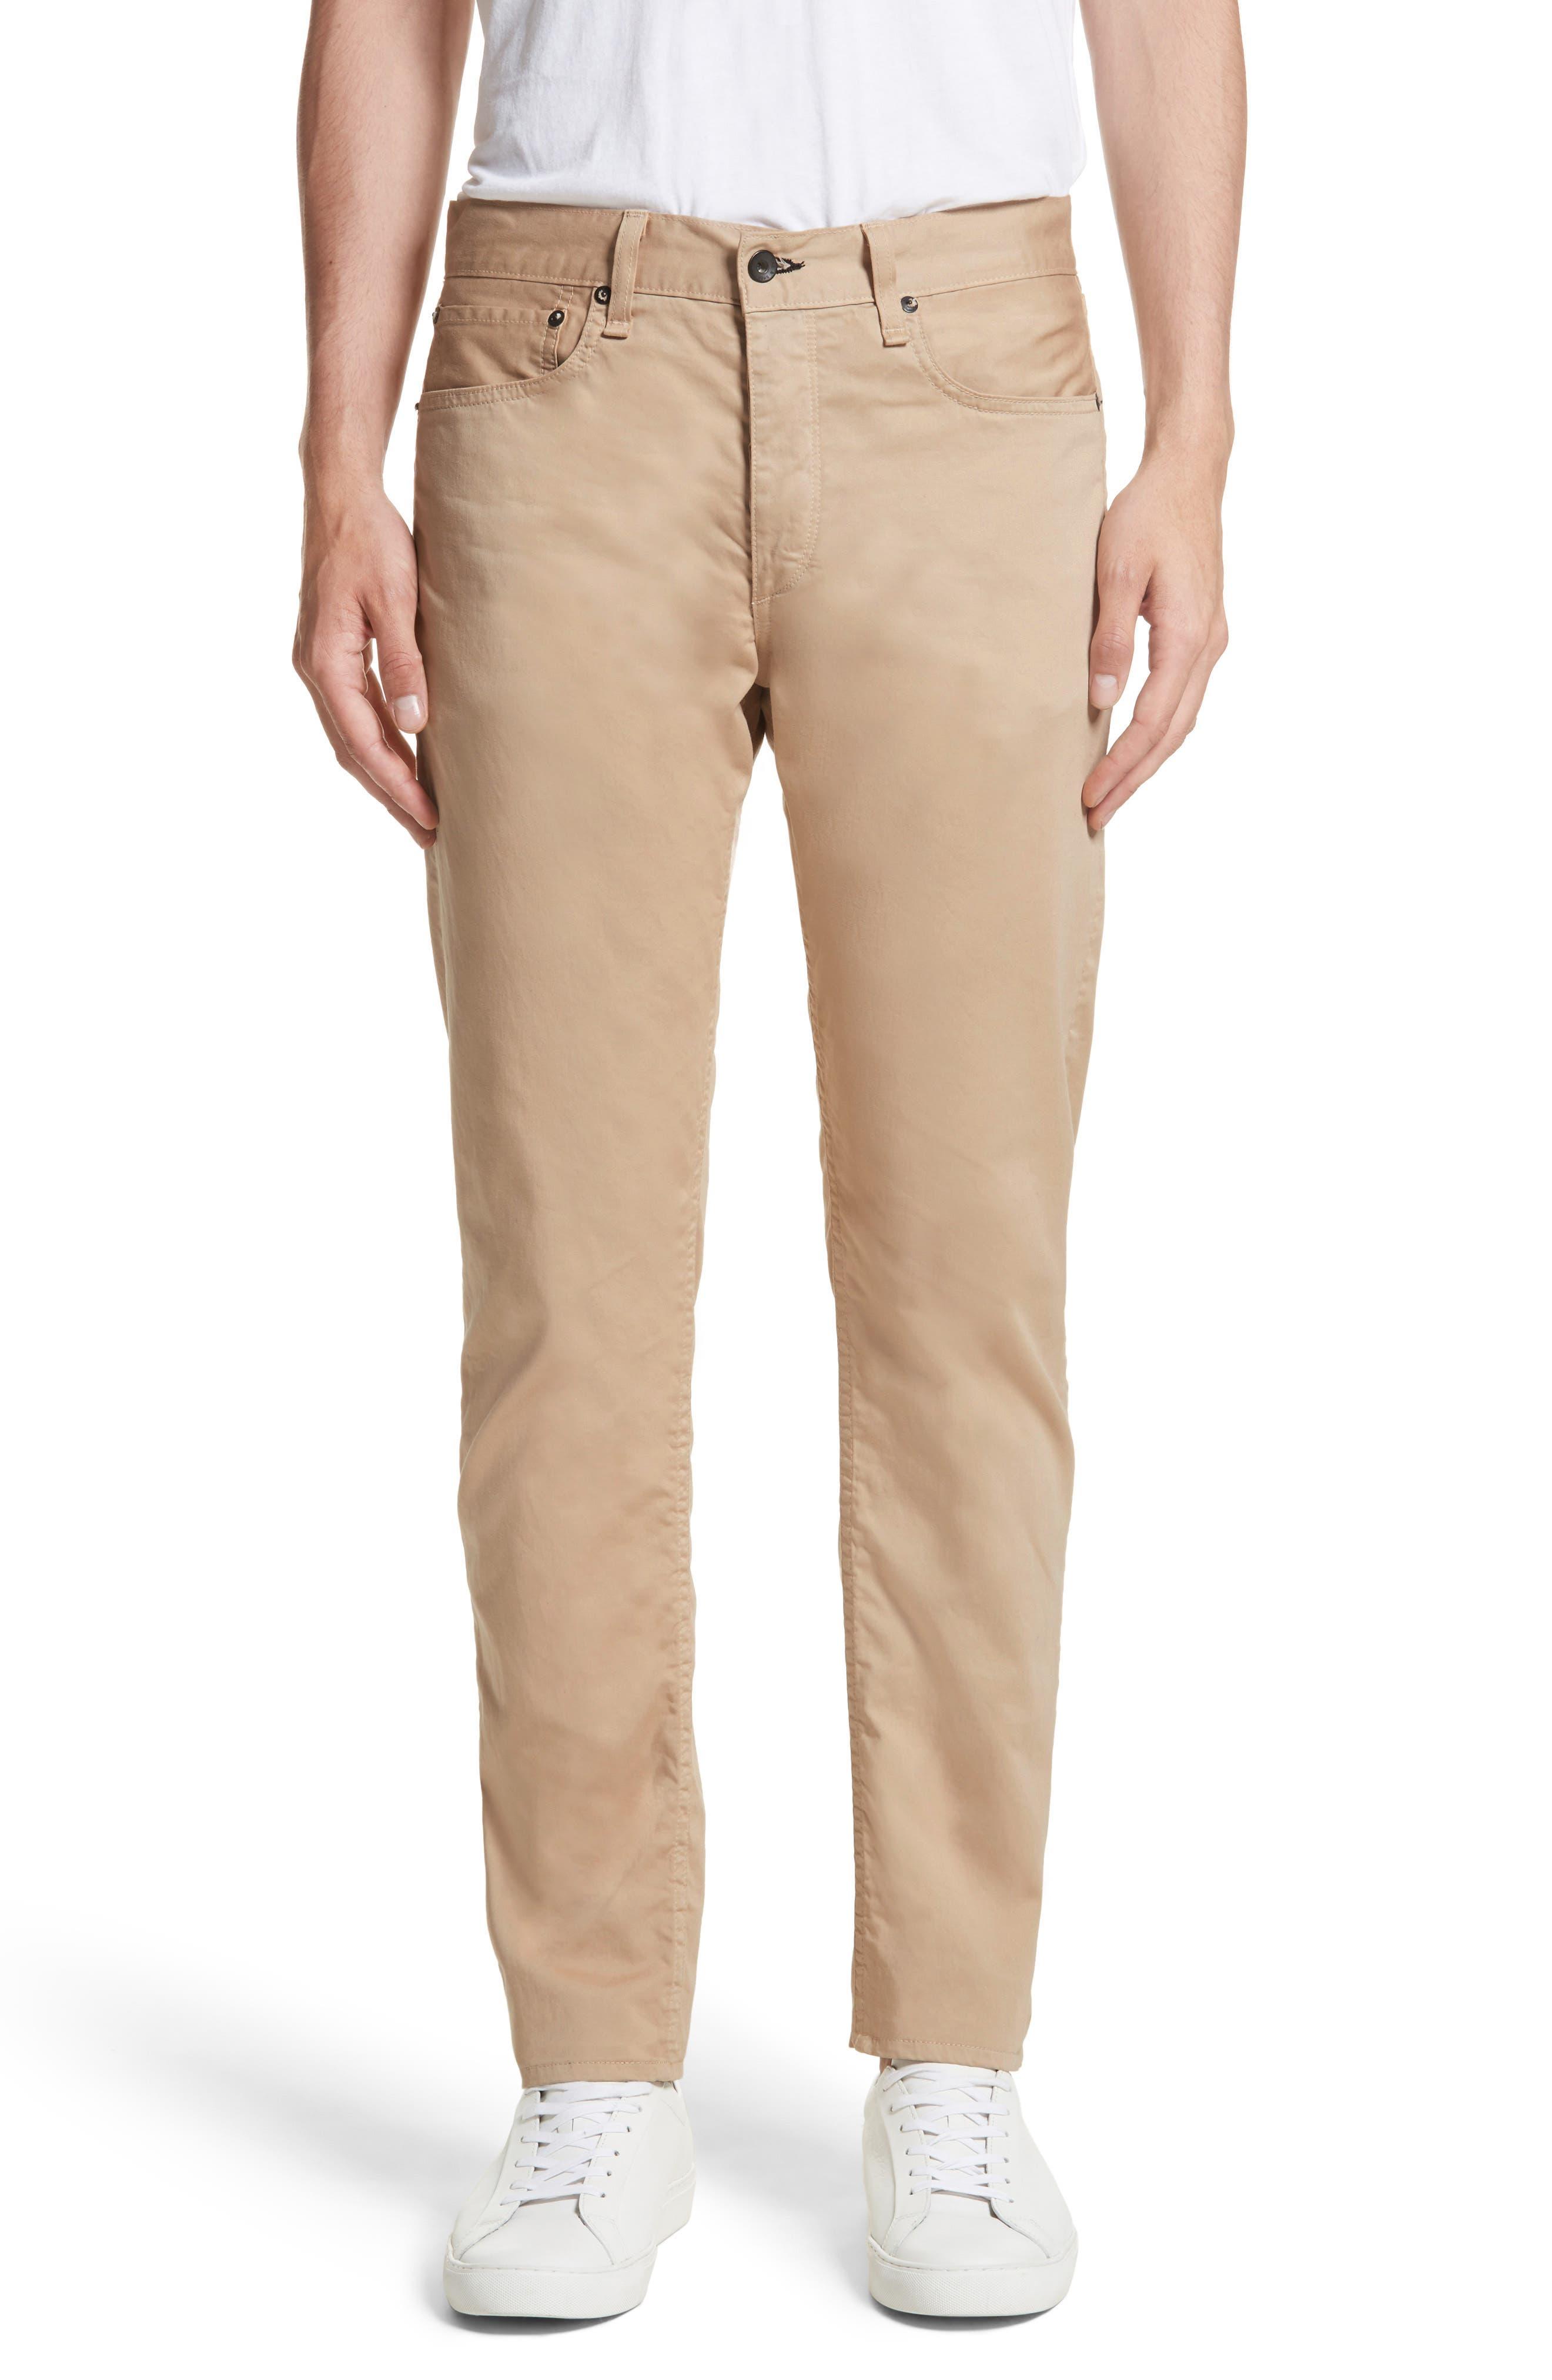 Fit 2 Five-Pocket Twill Pants,                         Main,                         color, BEIGE